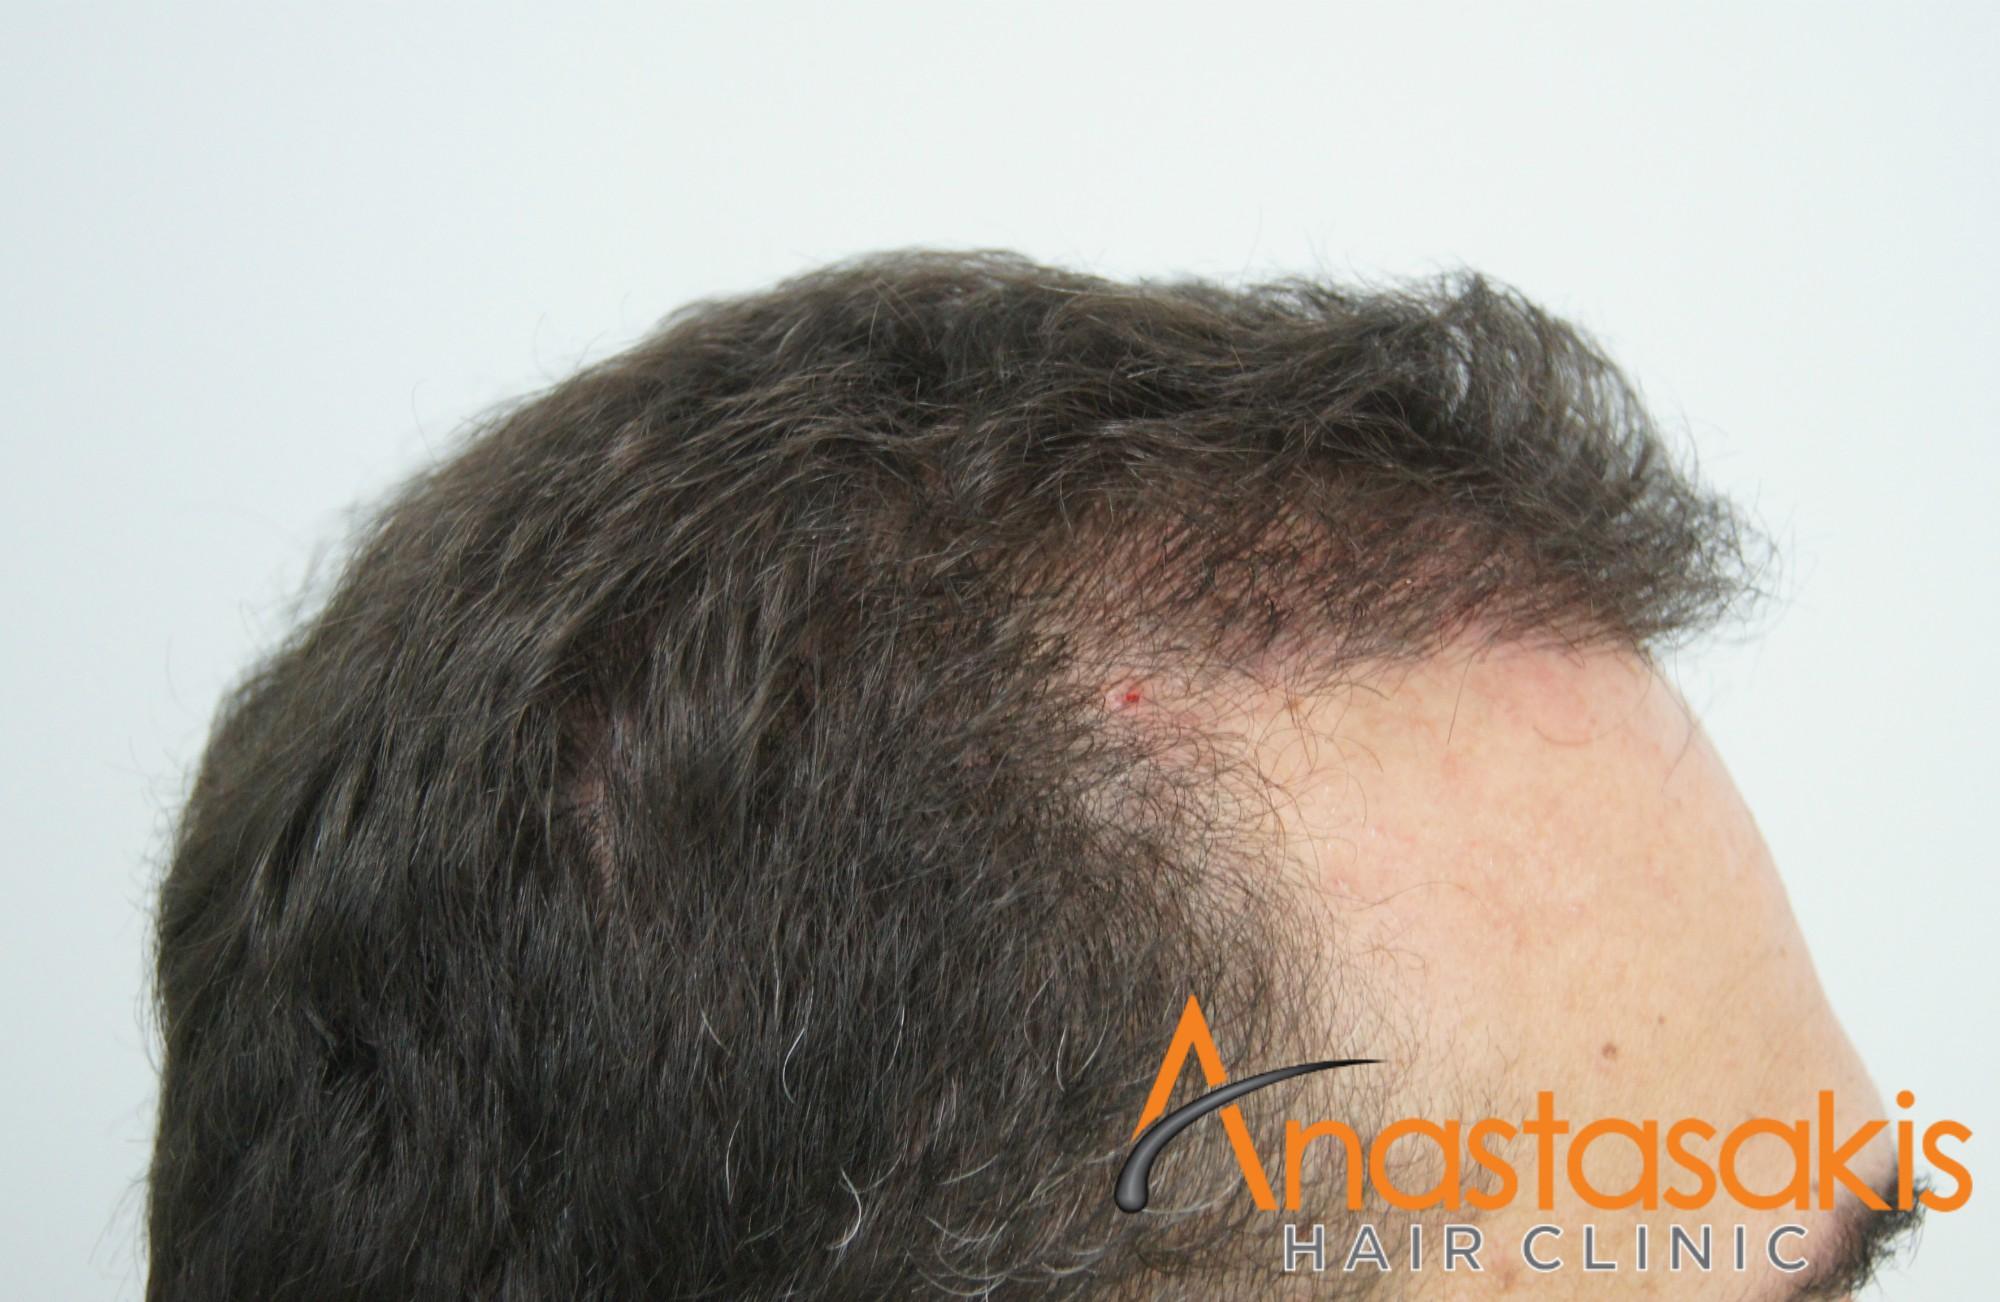 3000fus-fut-mm-anastasakis-hair-clinic